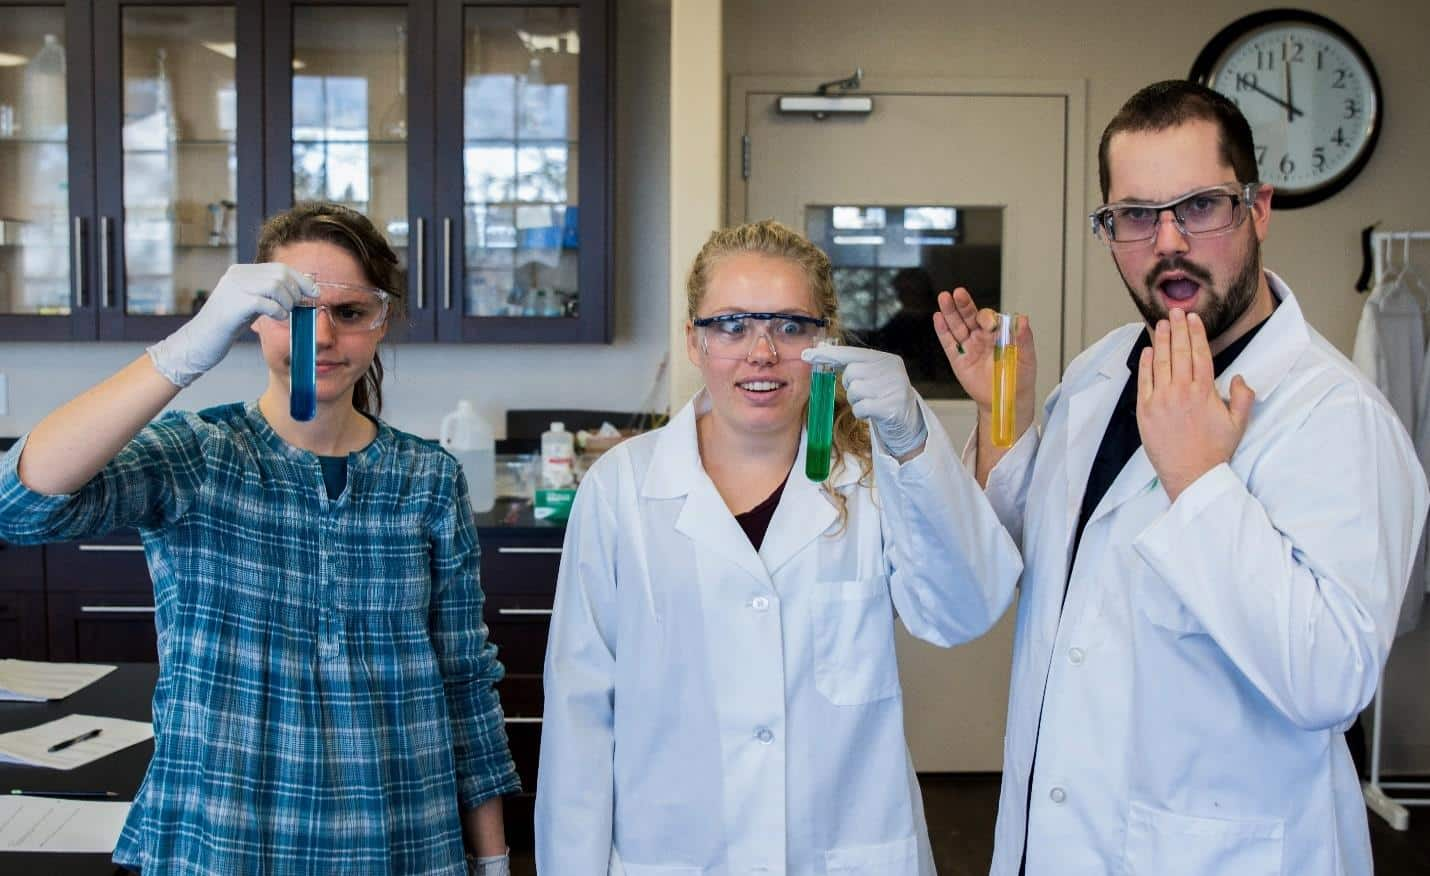 weimar-students-have-unique-labs